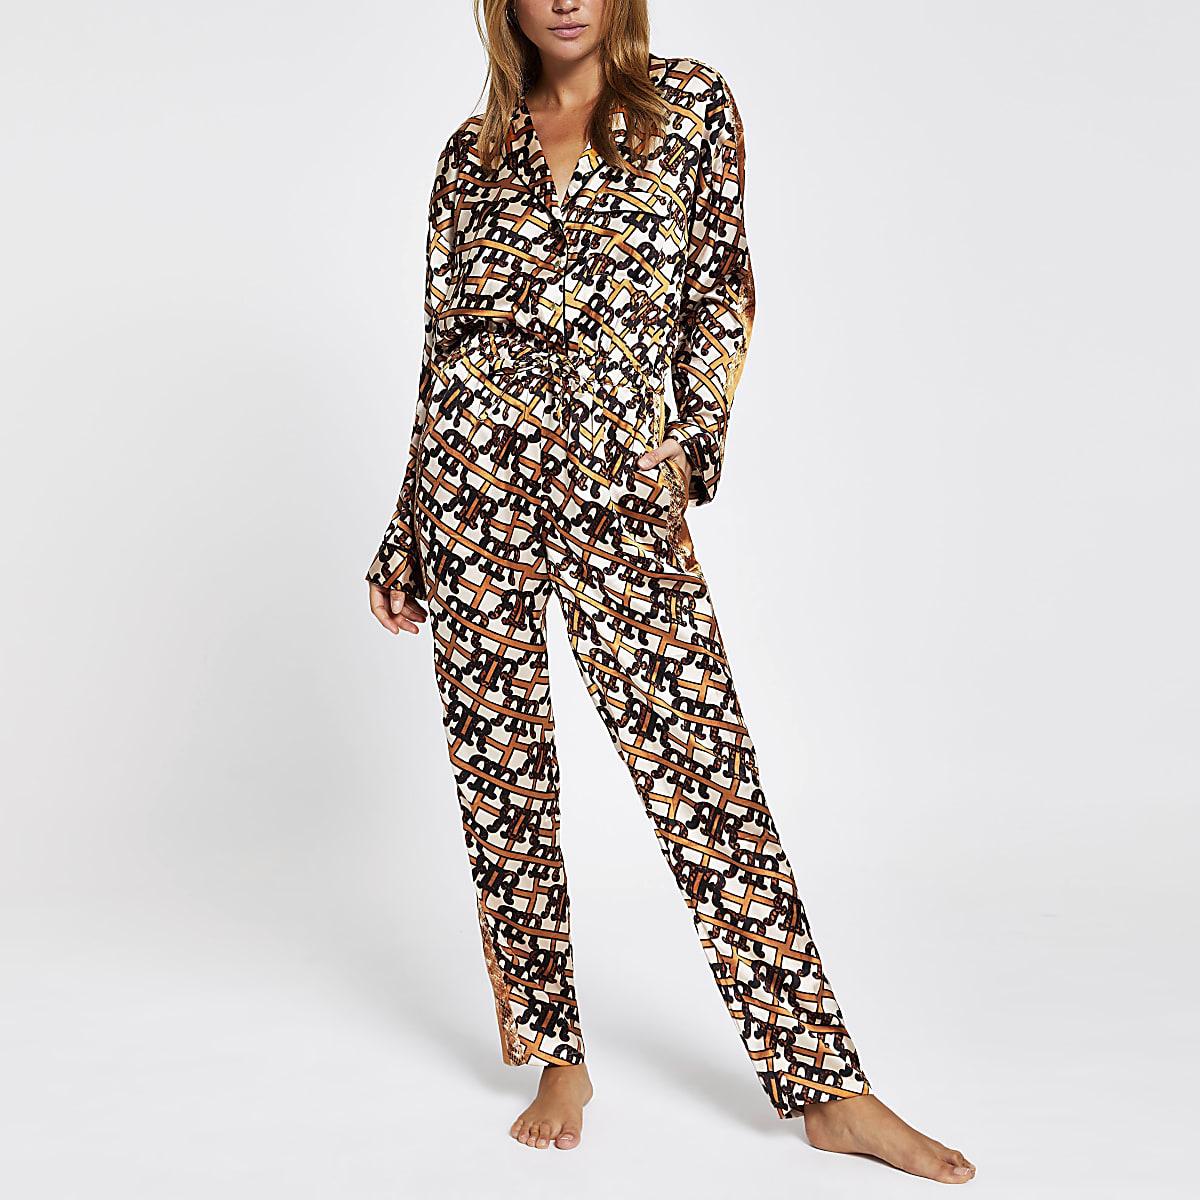 Bruine satijnen pyjamajumpsuit met RI-print